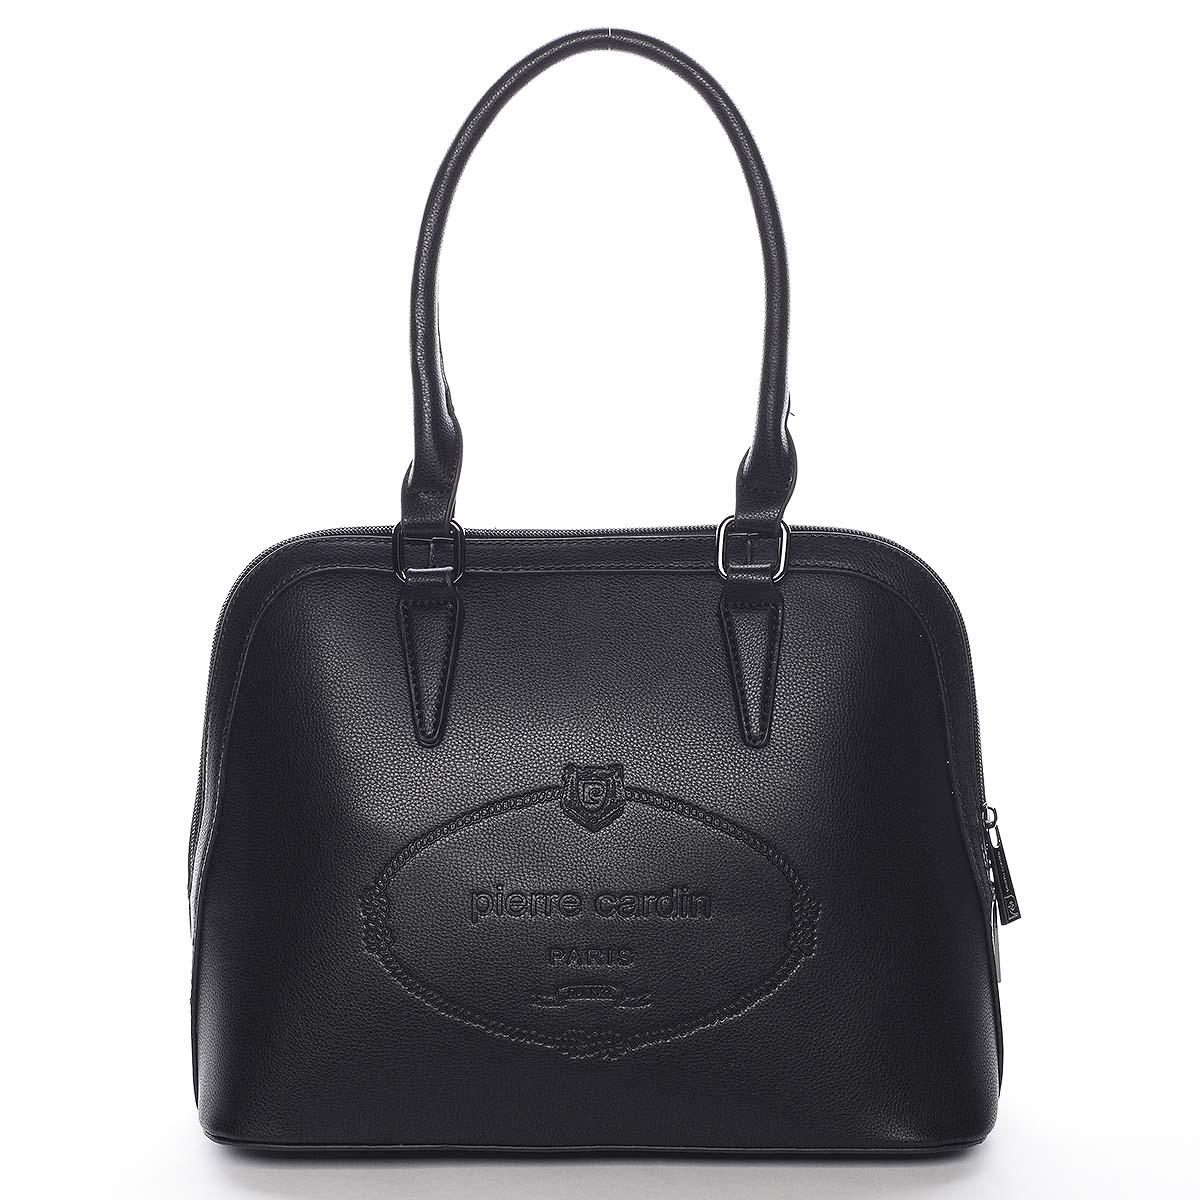 Dámska kabelka do ruky čierna - Pierre Cardin Beliana čierna